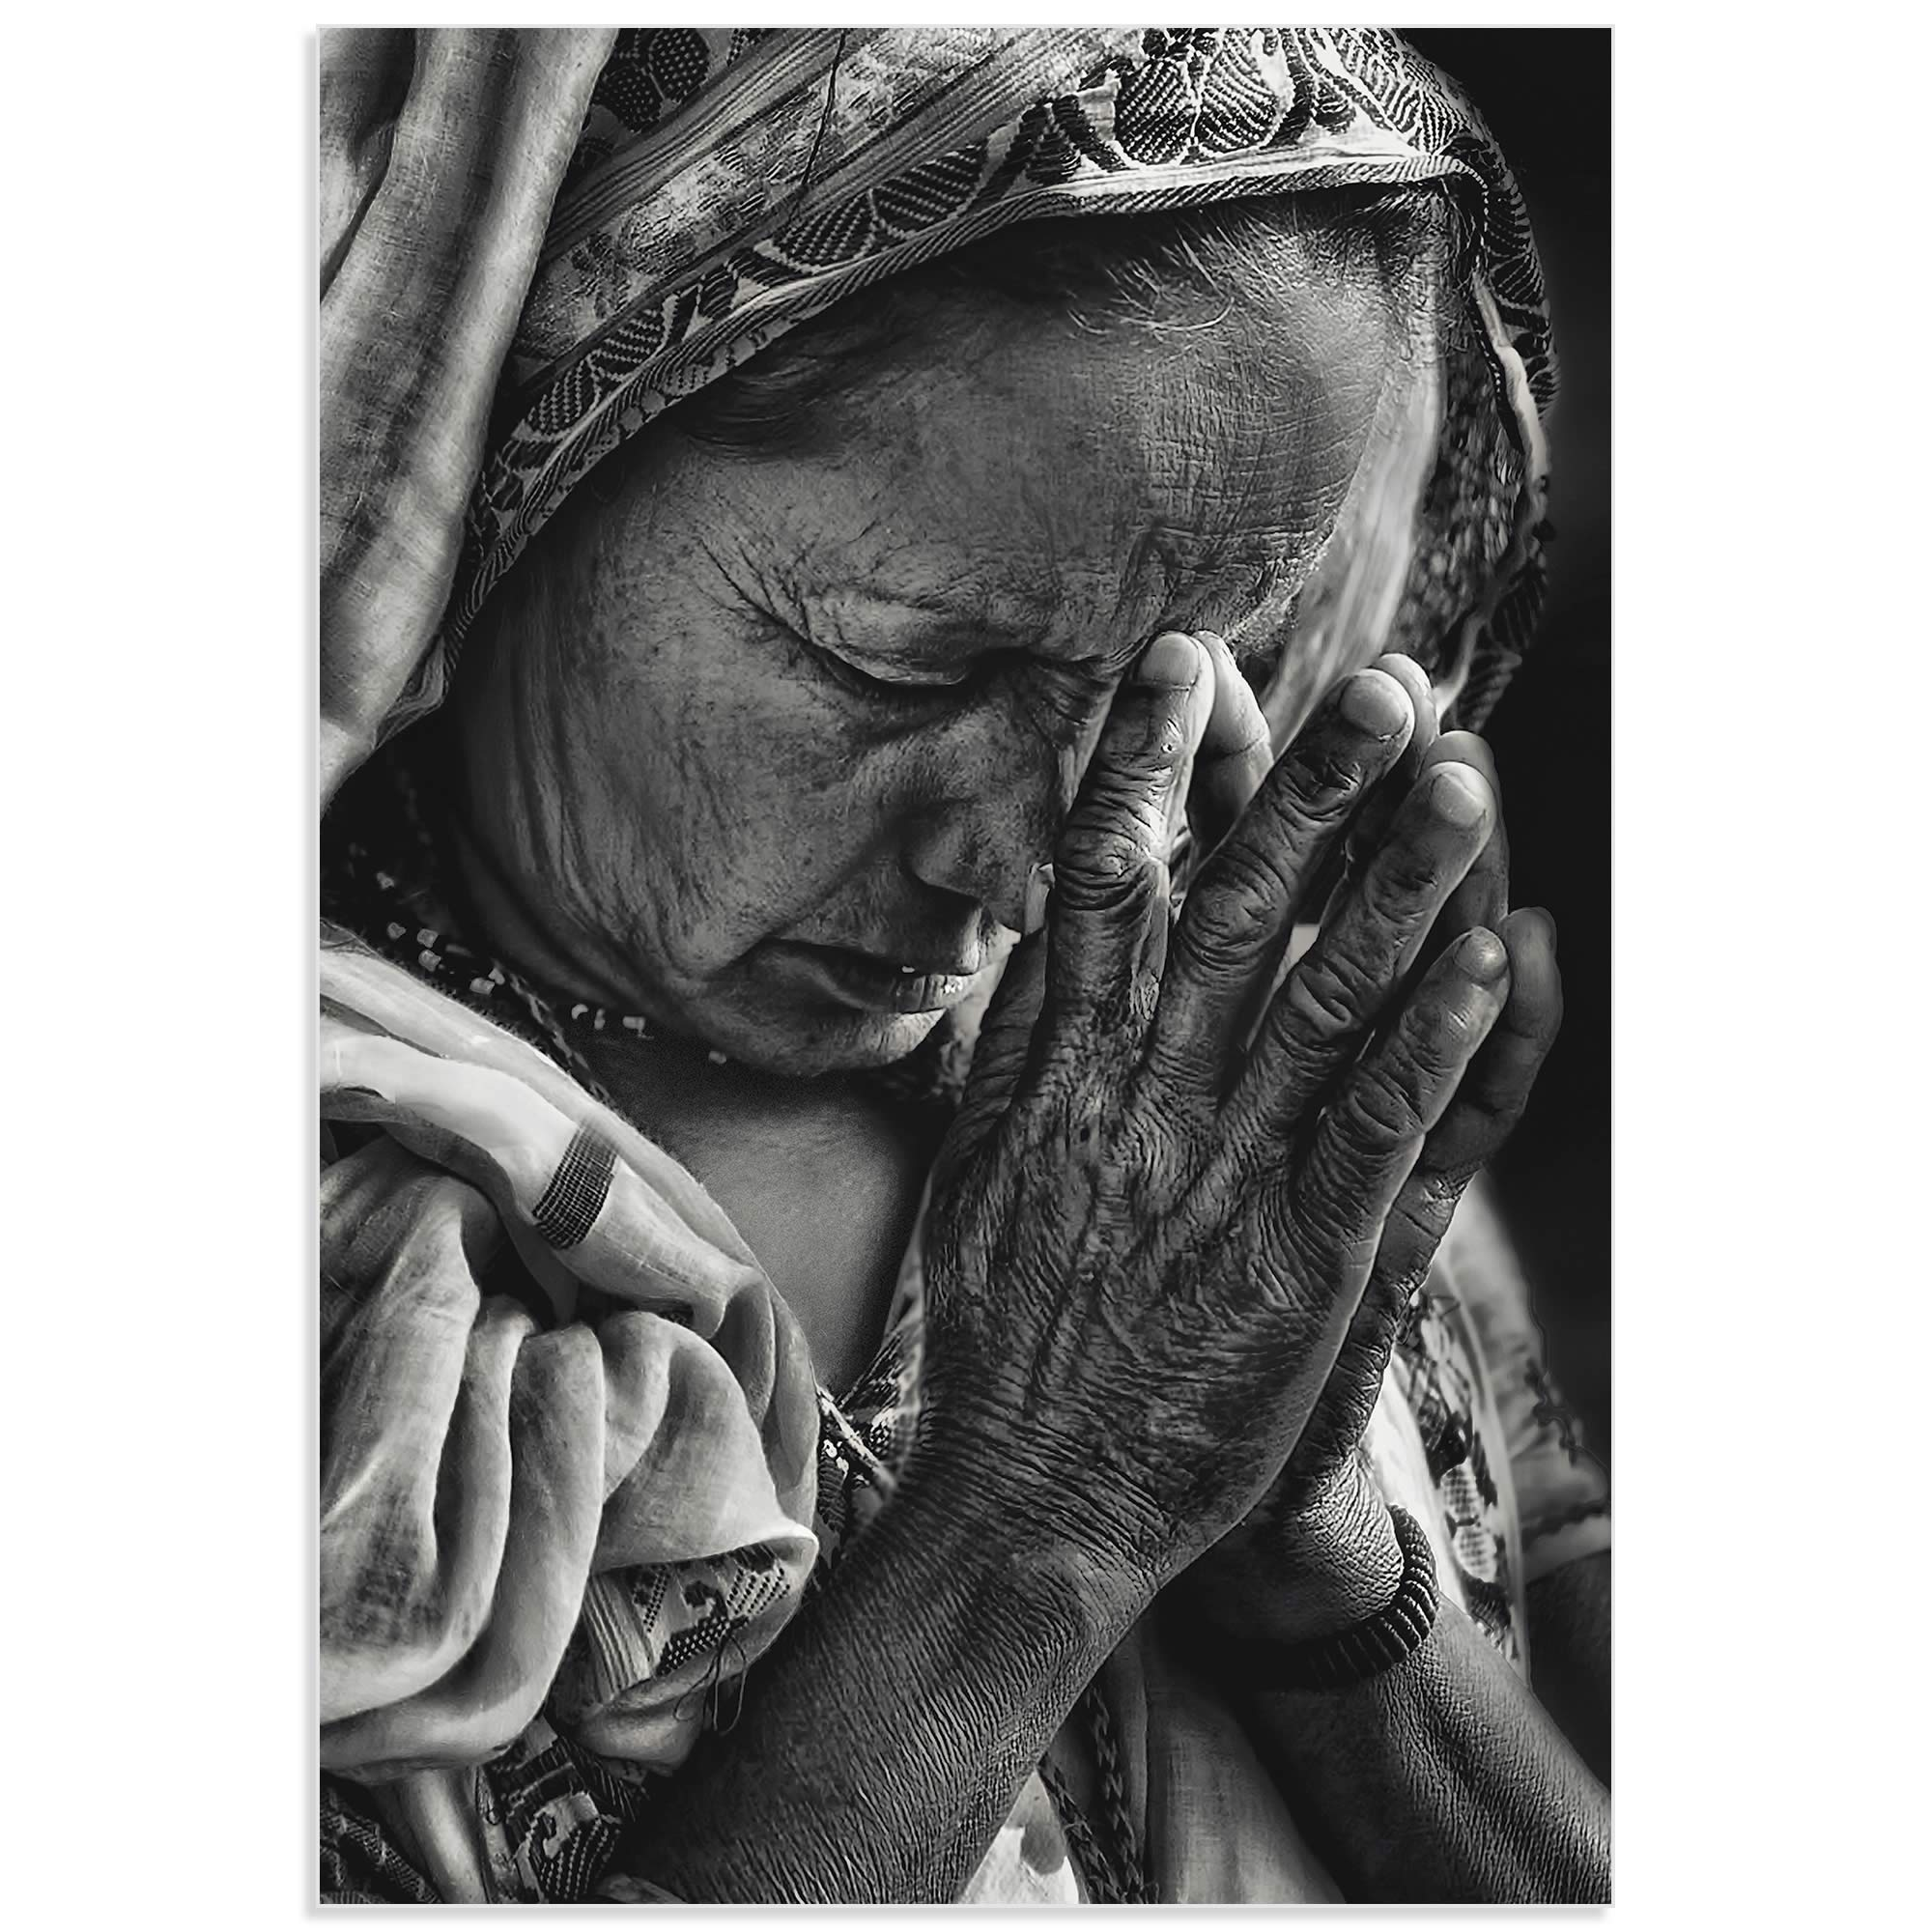 Prayers by Piet Flour - Hindu Prayer Art on Metal or Acrylic - Alternate View 2